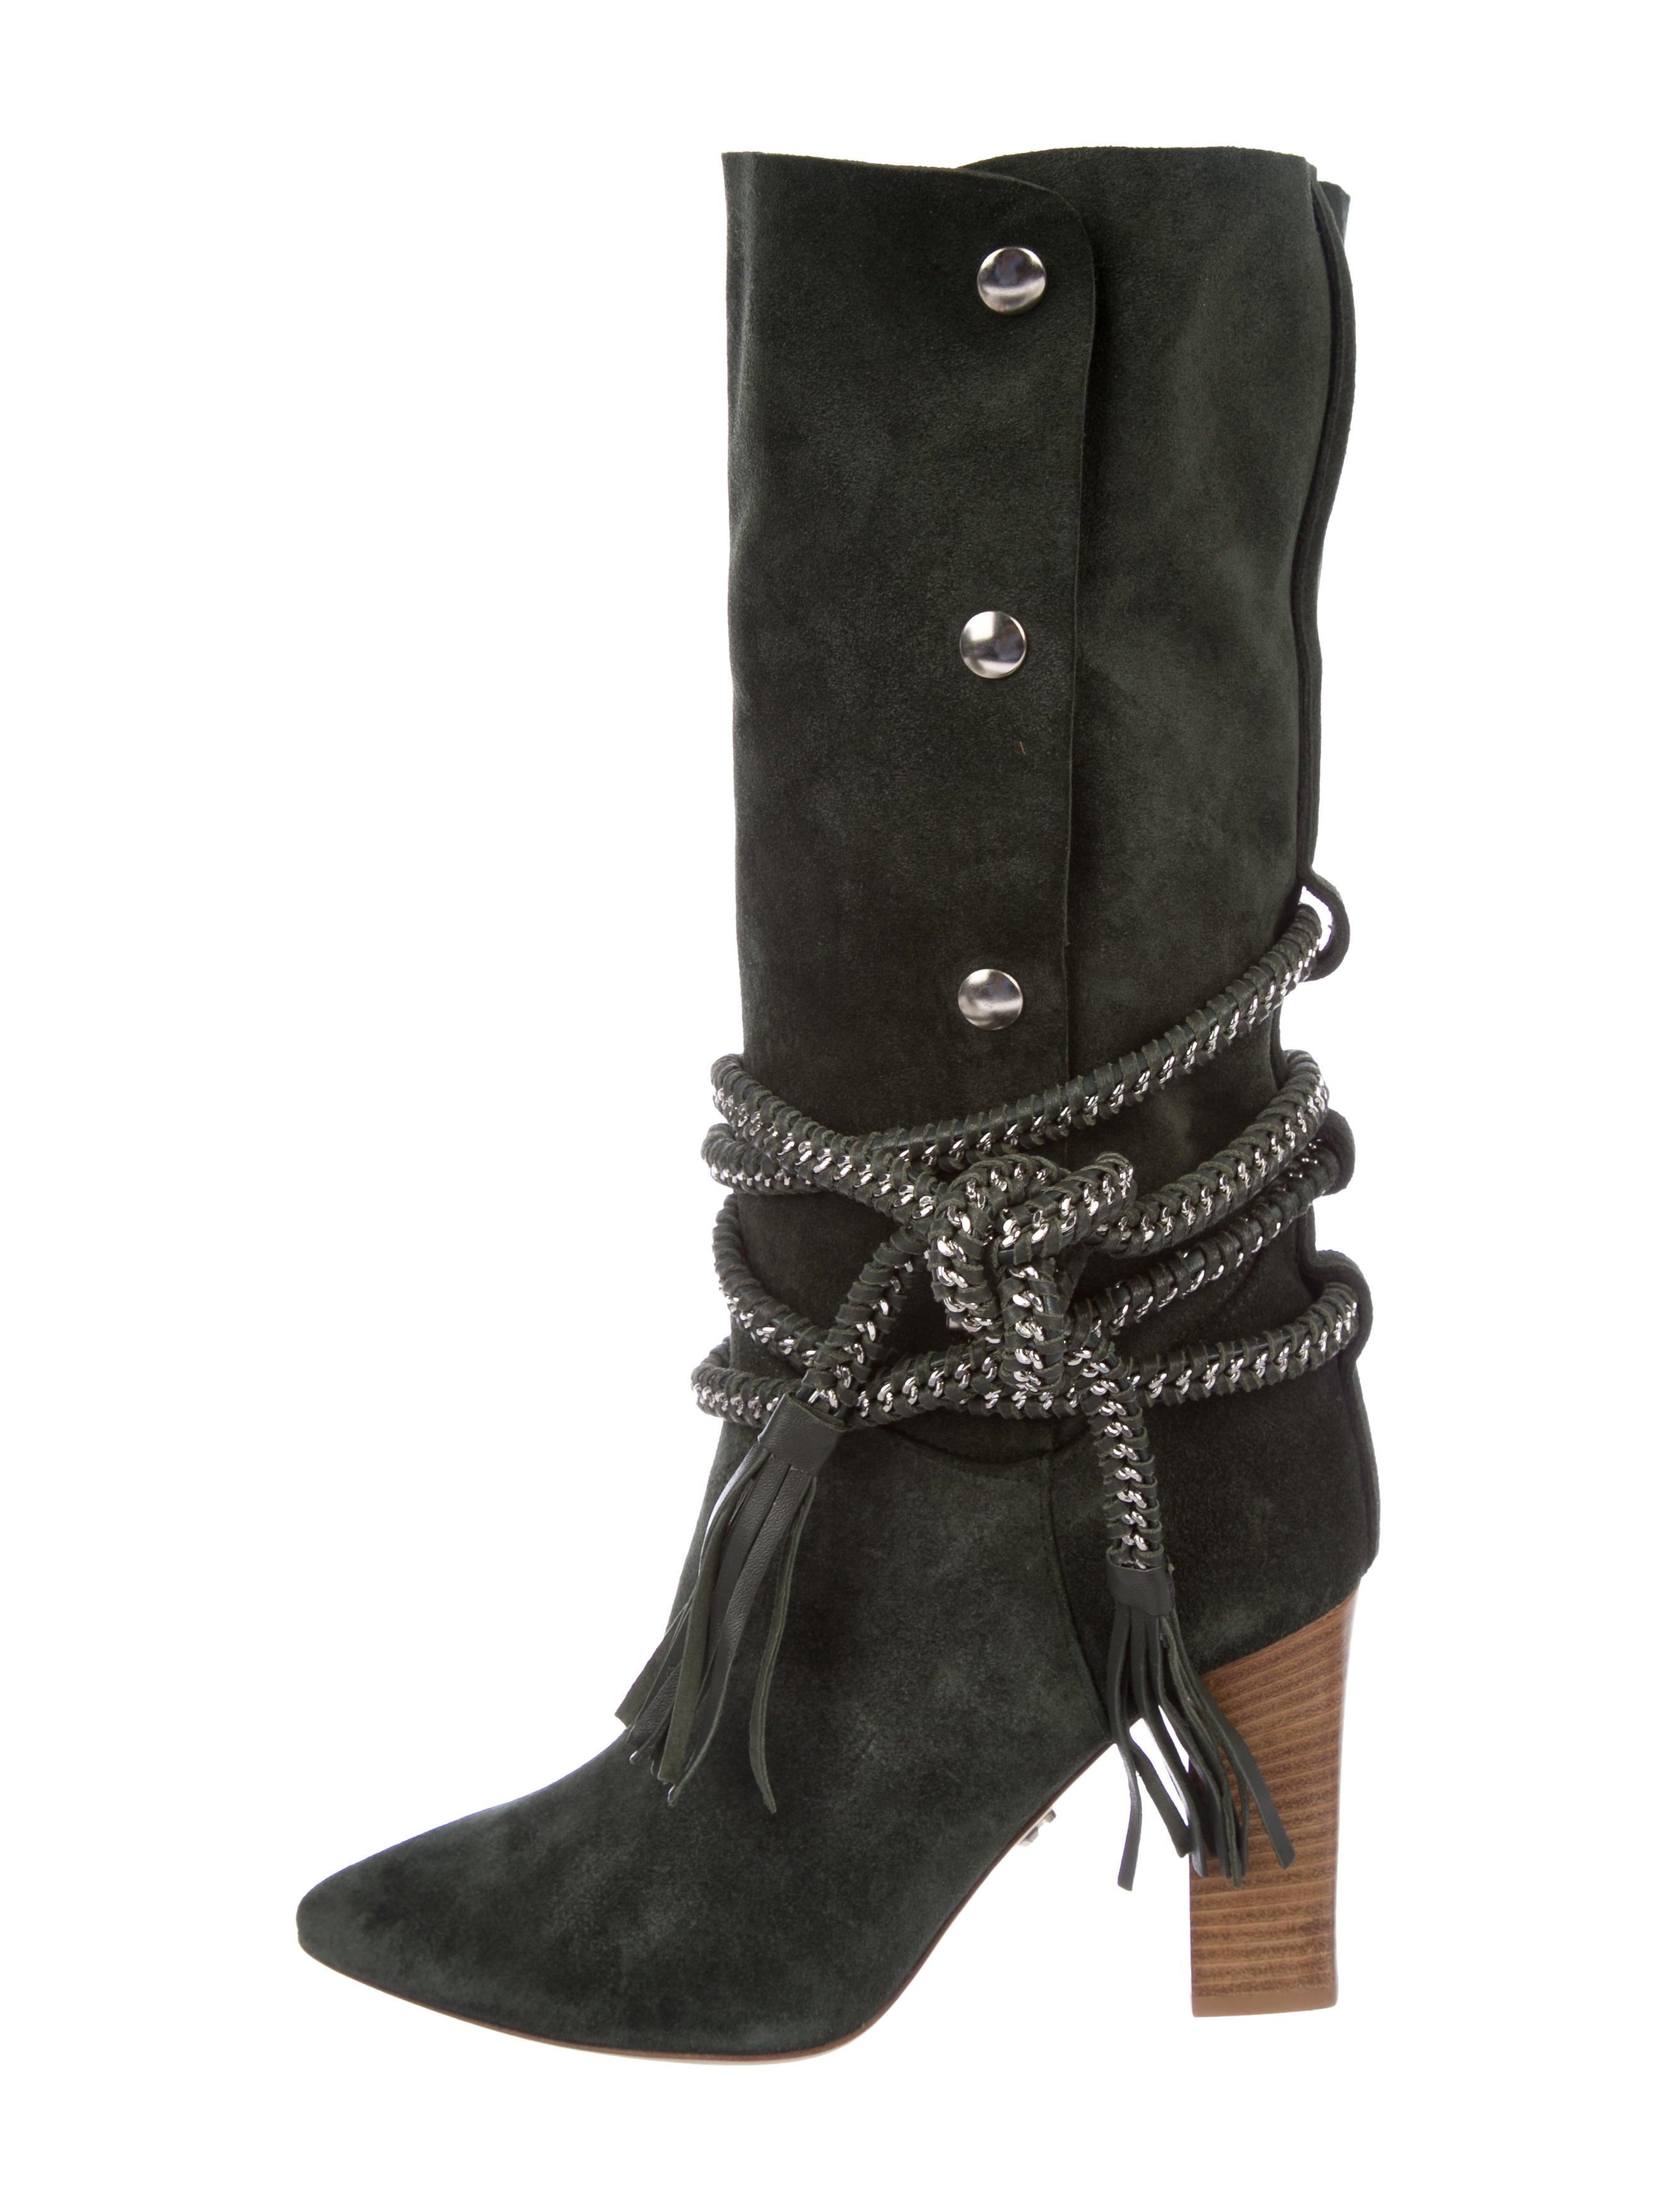 Monika Chiang Dionna Suede Boots w/ Tags free shipping cheap h7xo2zHvgg